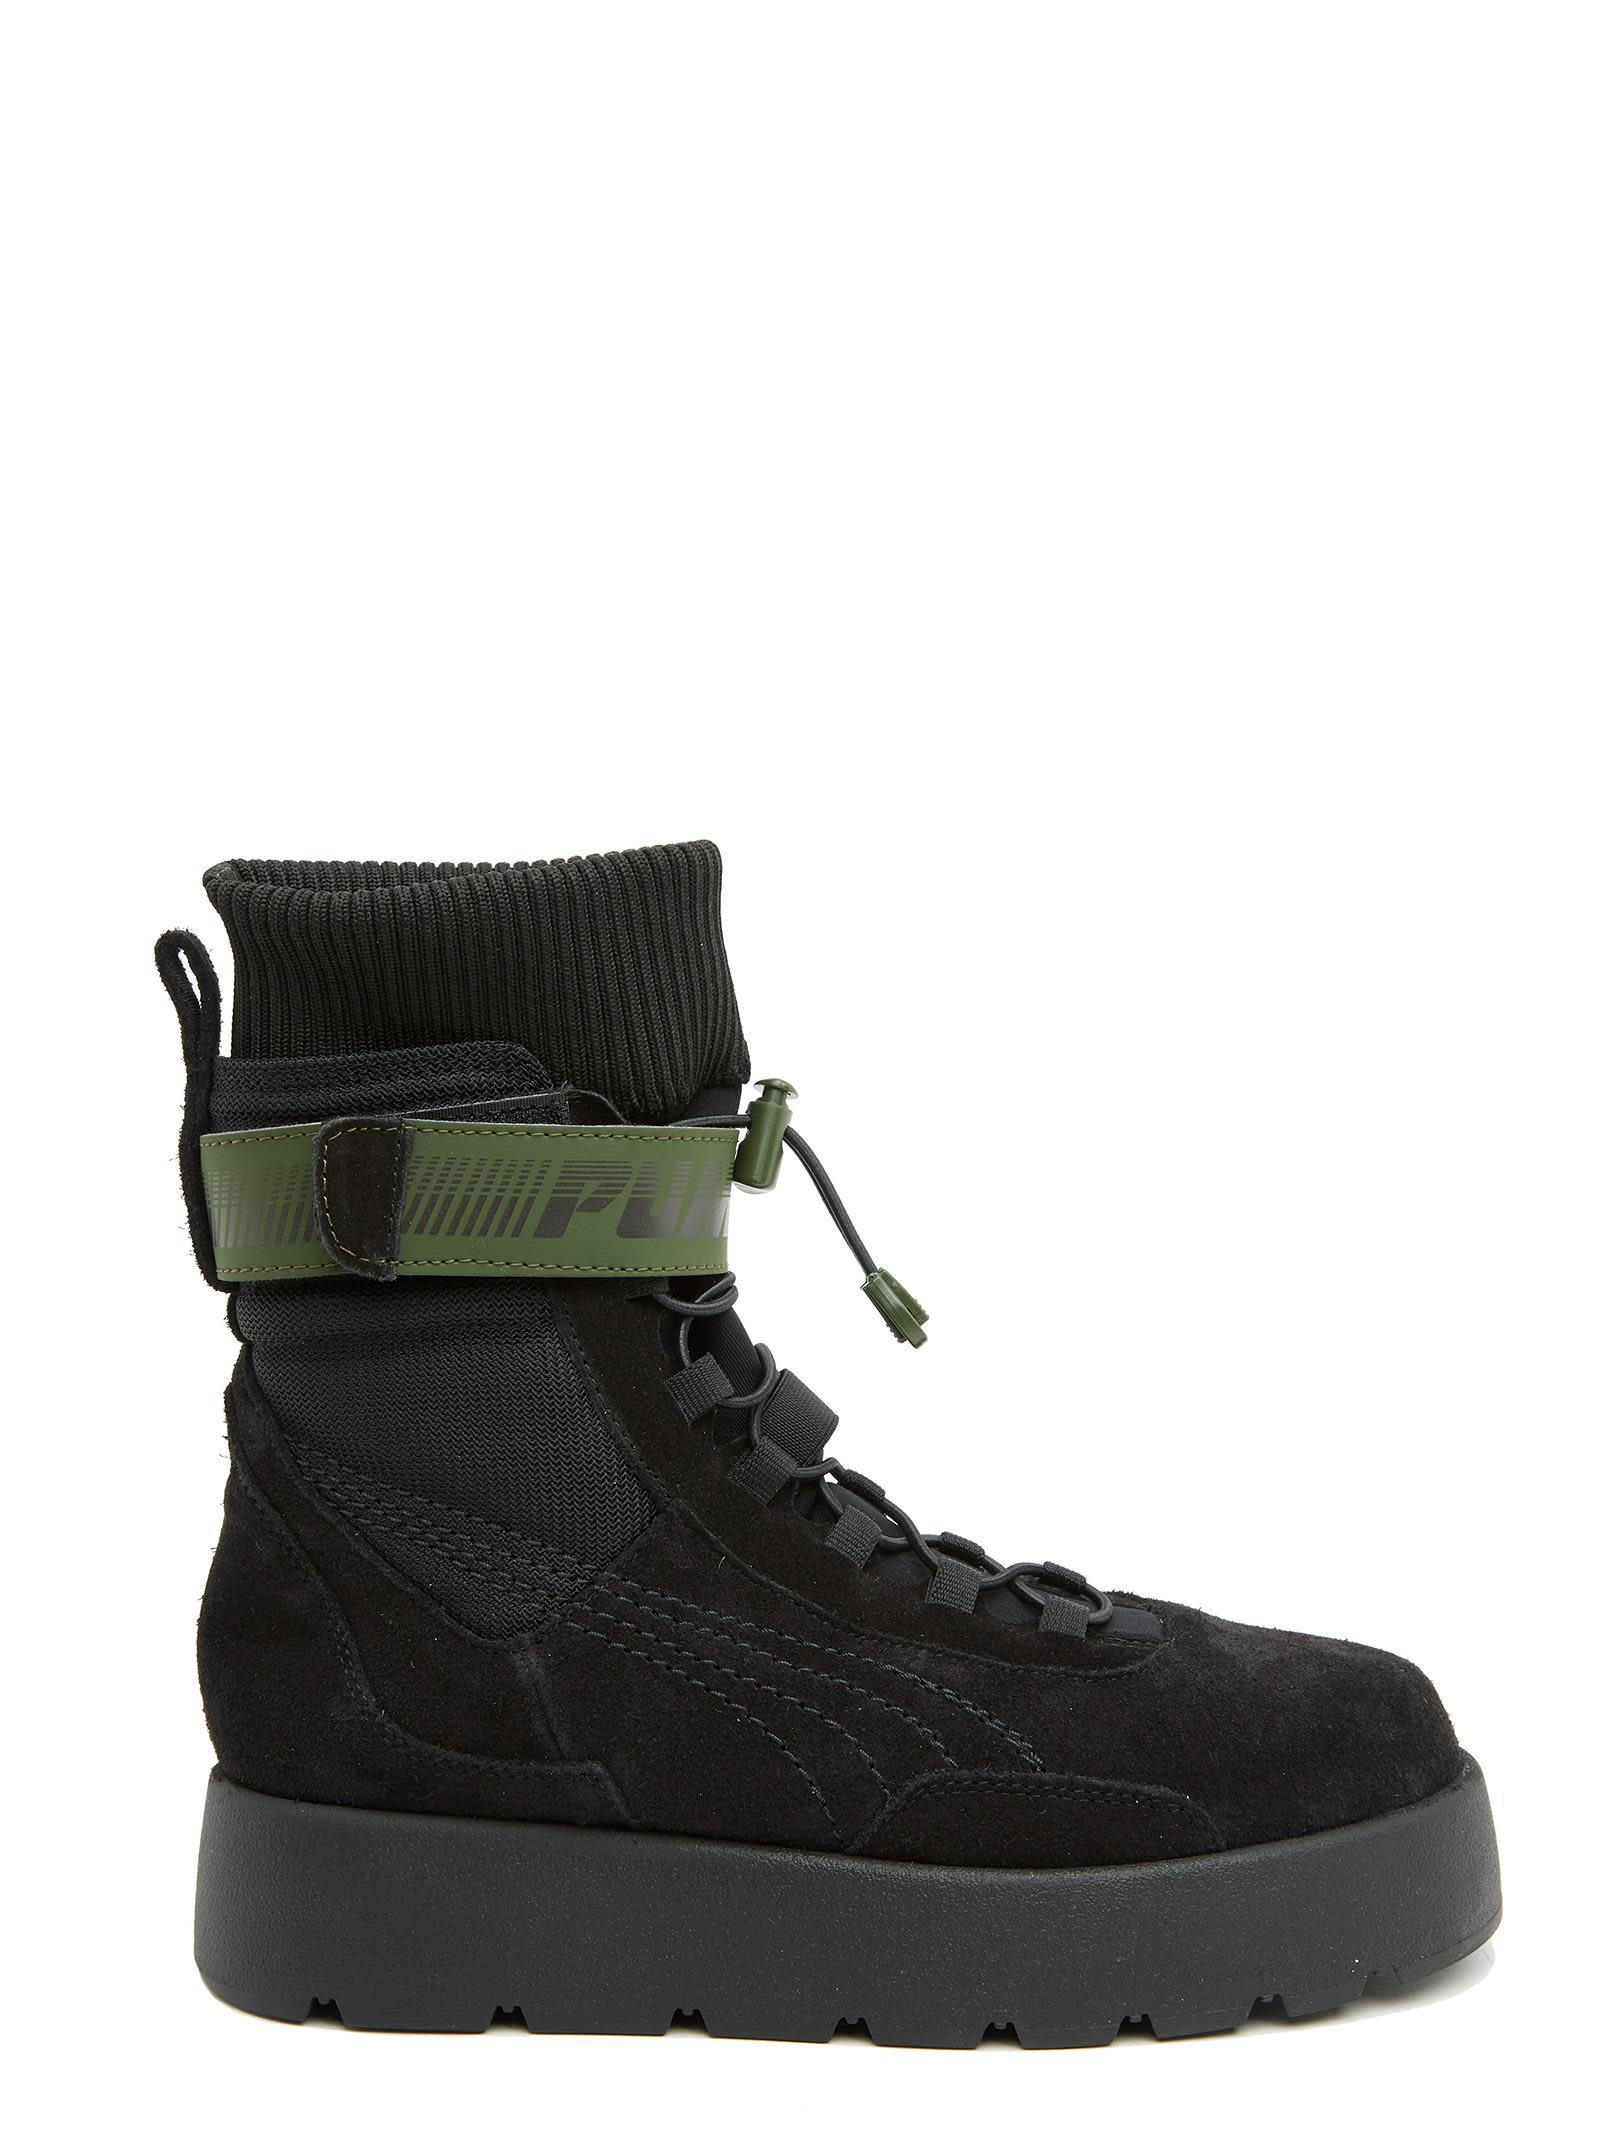 brand new 1e33c 682ac Fenty Puma By Rihanna Scuba Shoes in Black